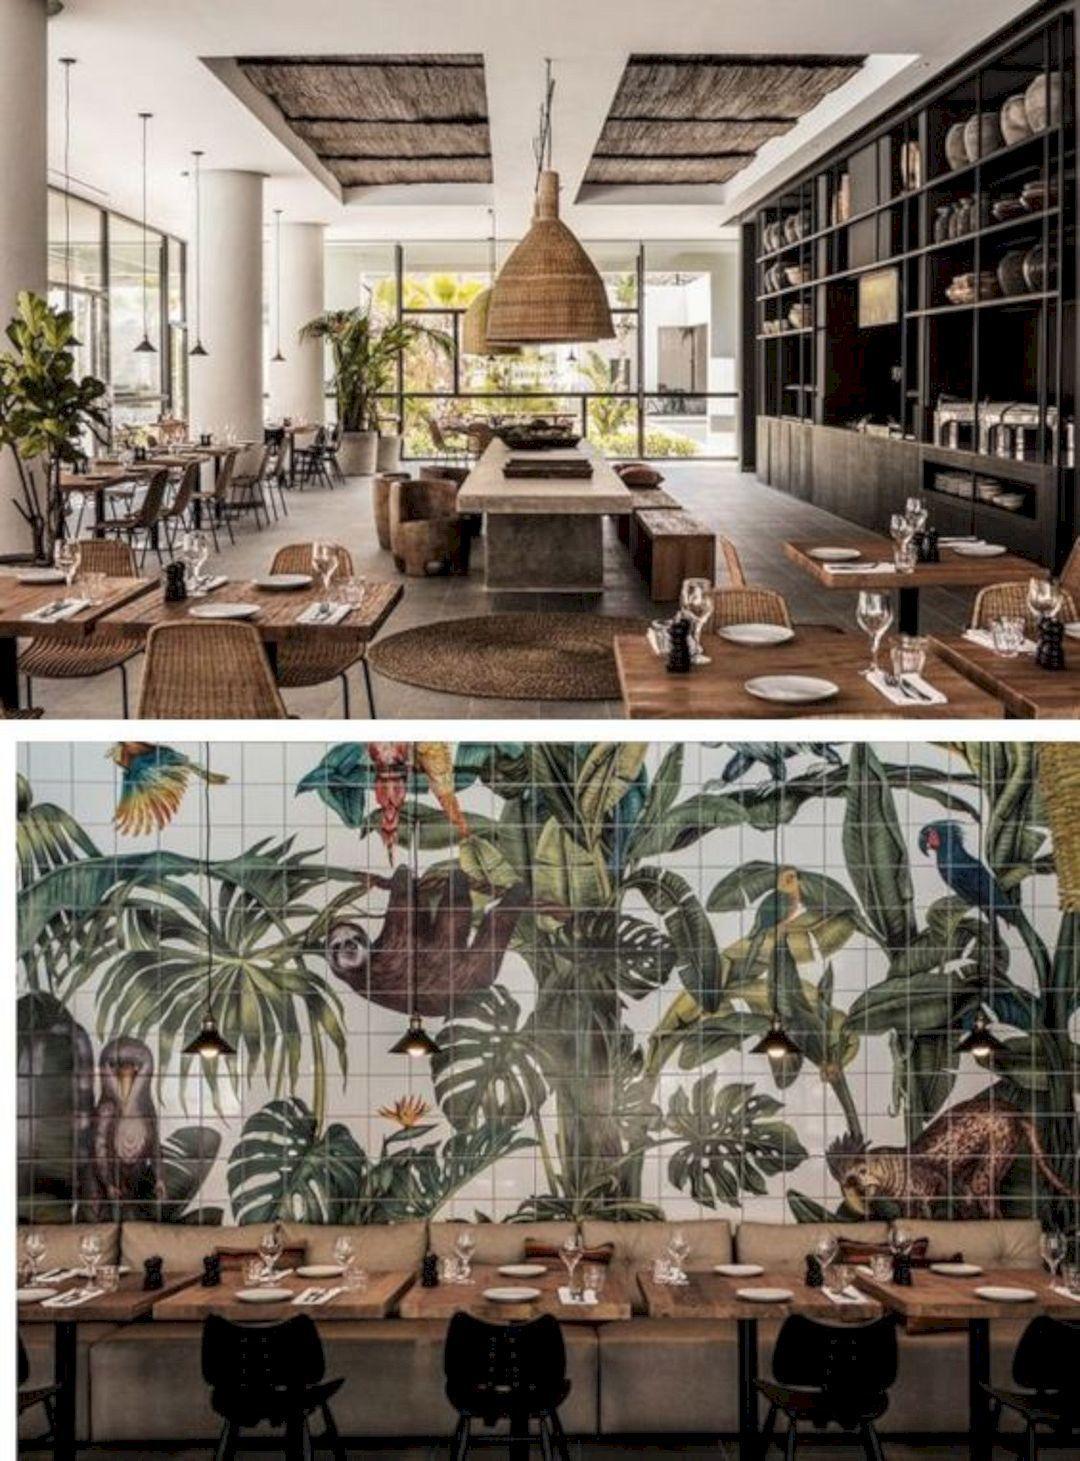 15 Stylish Interior Design Ideas for Thai Restaurant ...